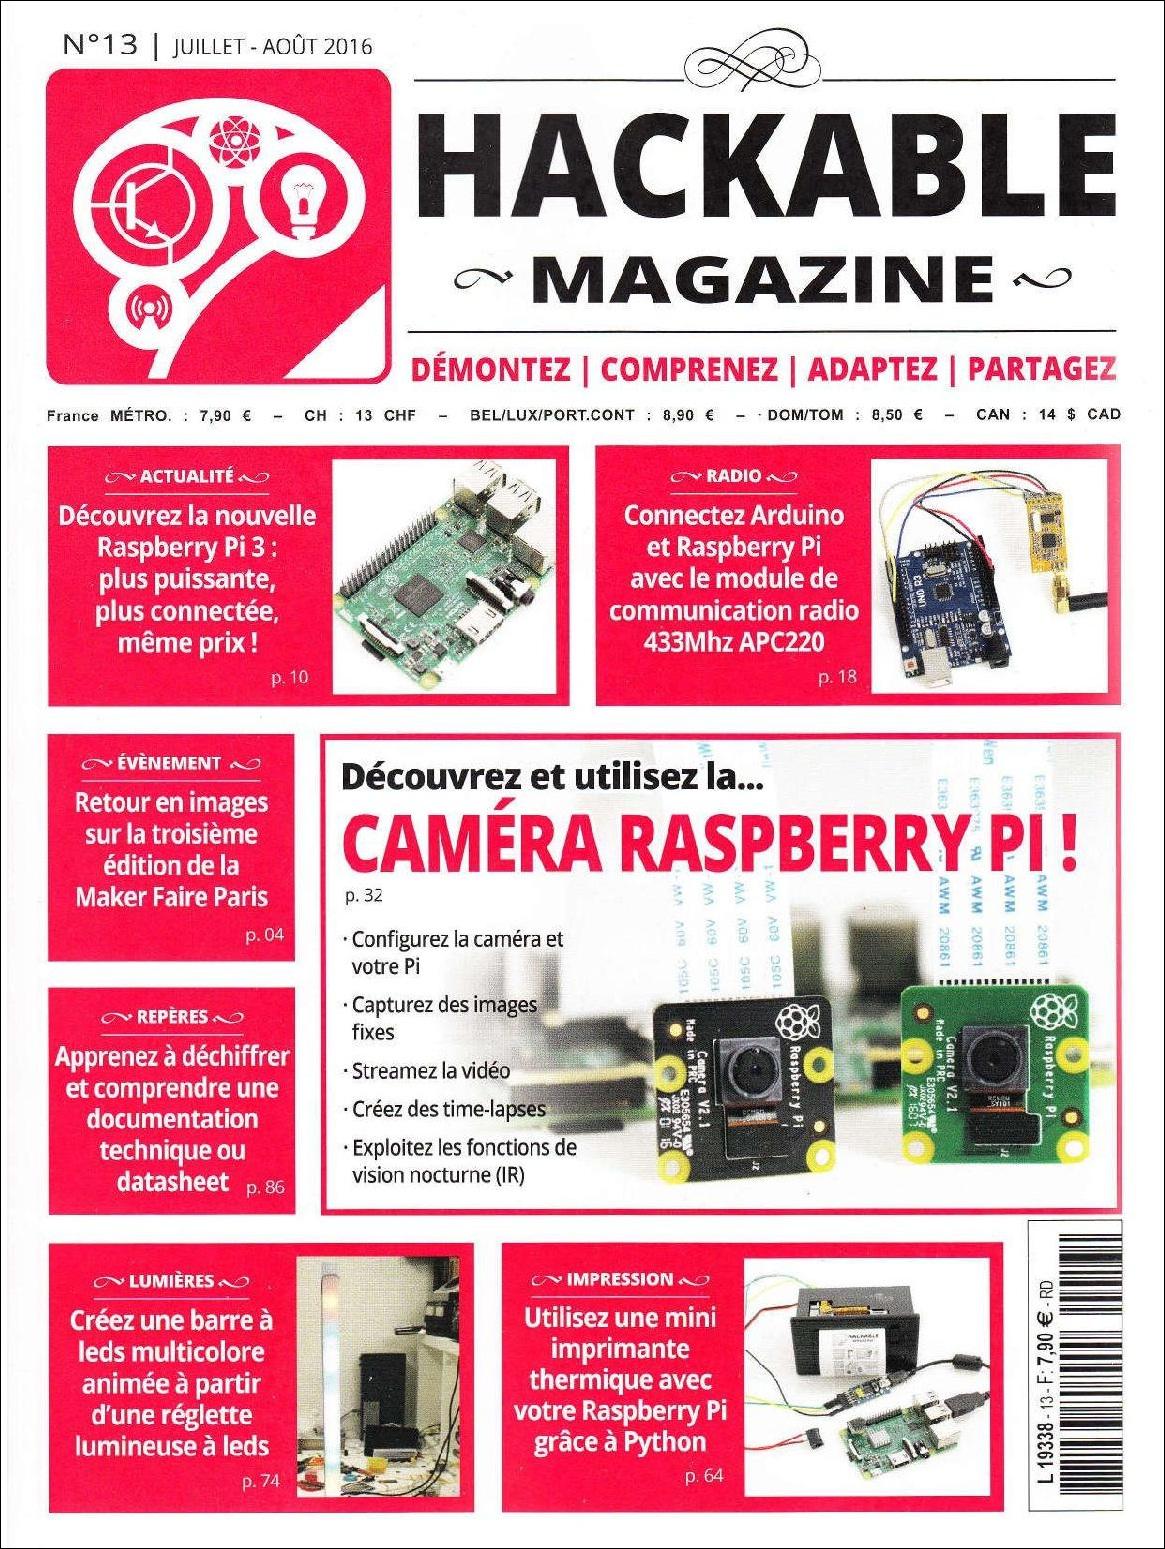 Hackable Magazine N°13 - Juillet/Août 2016